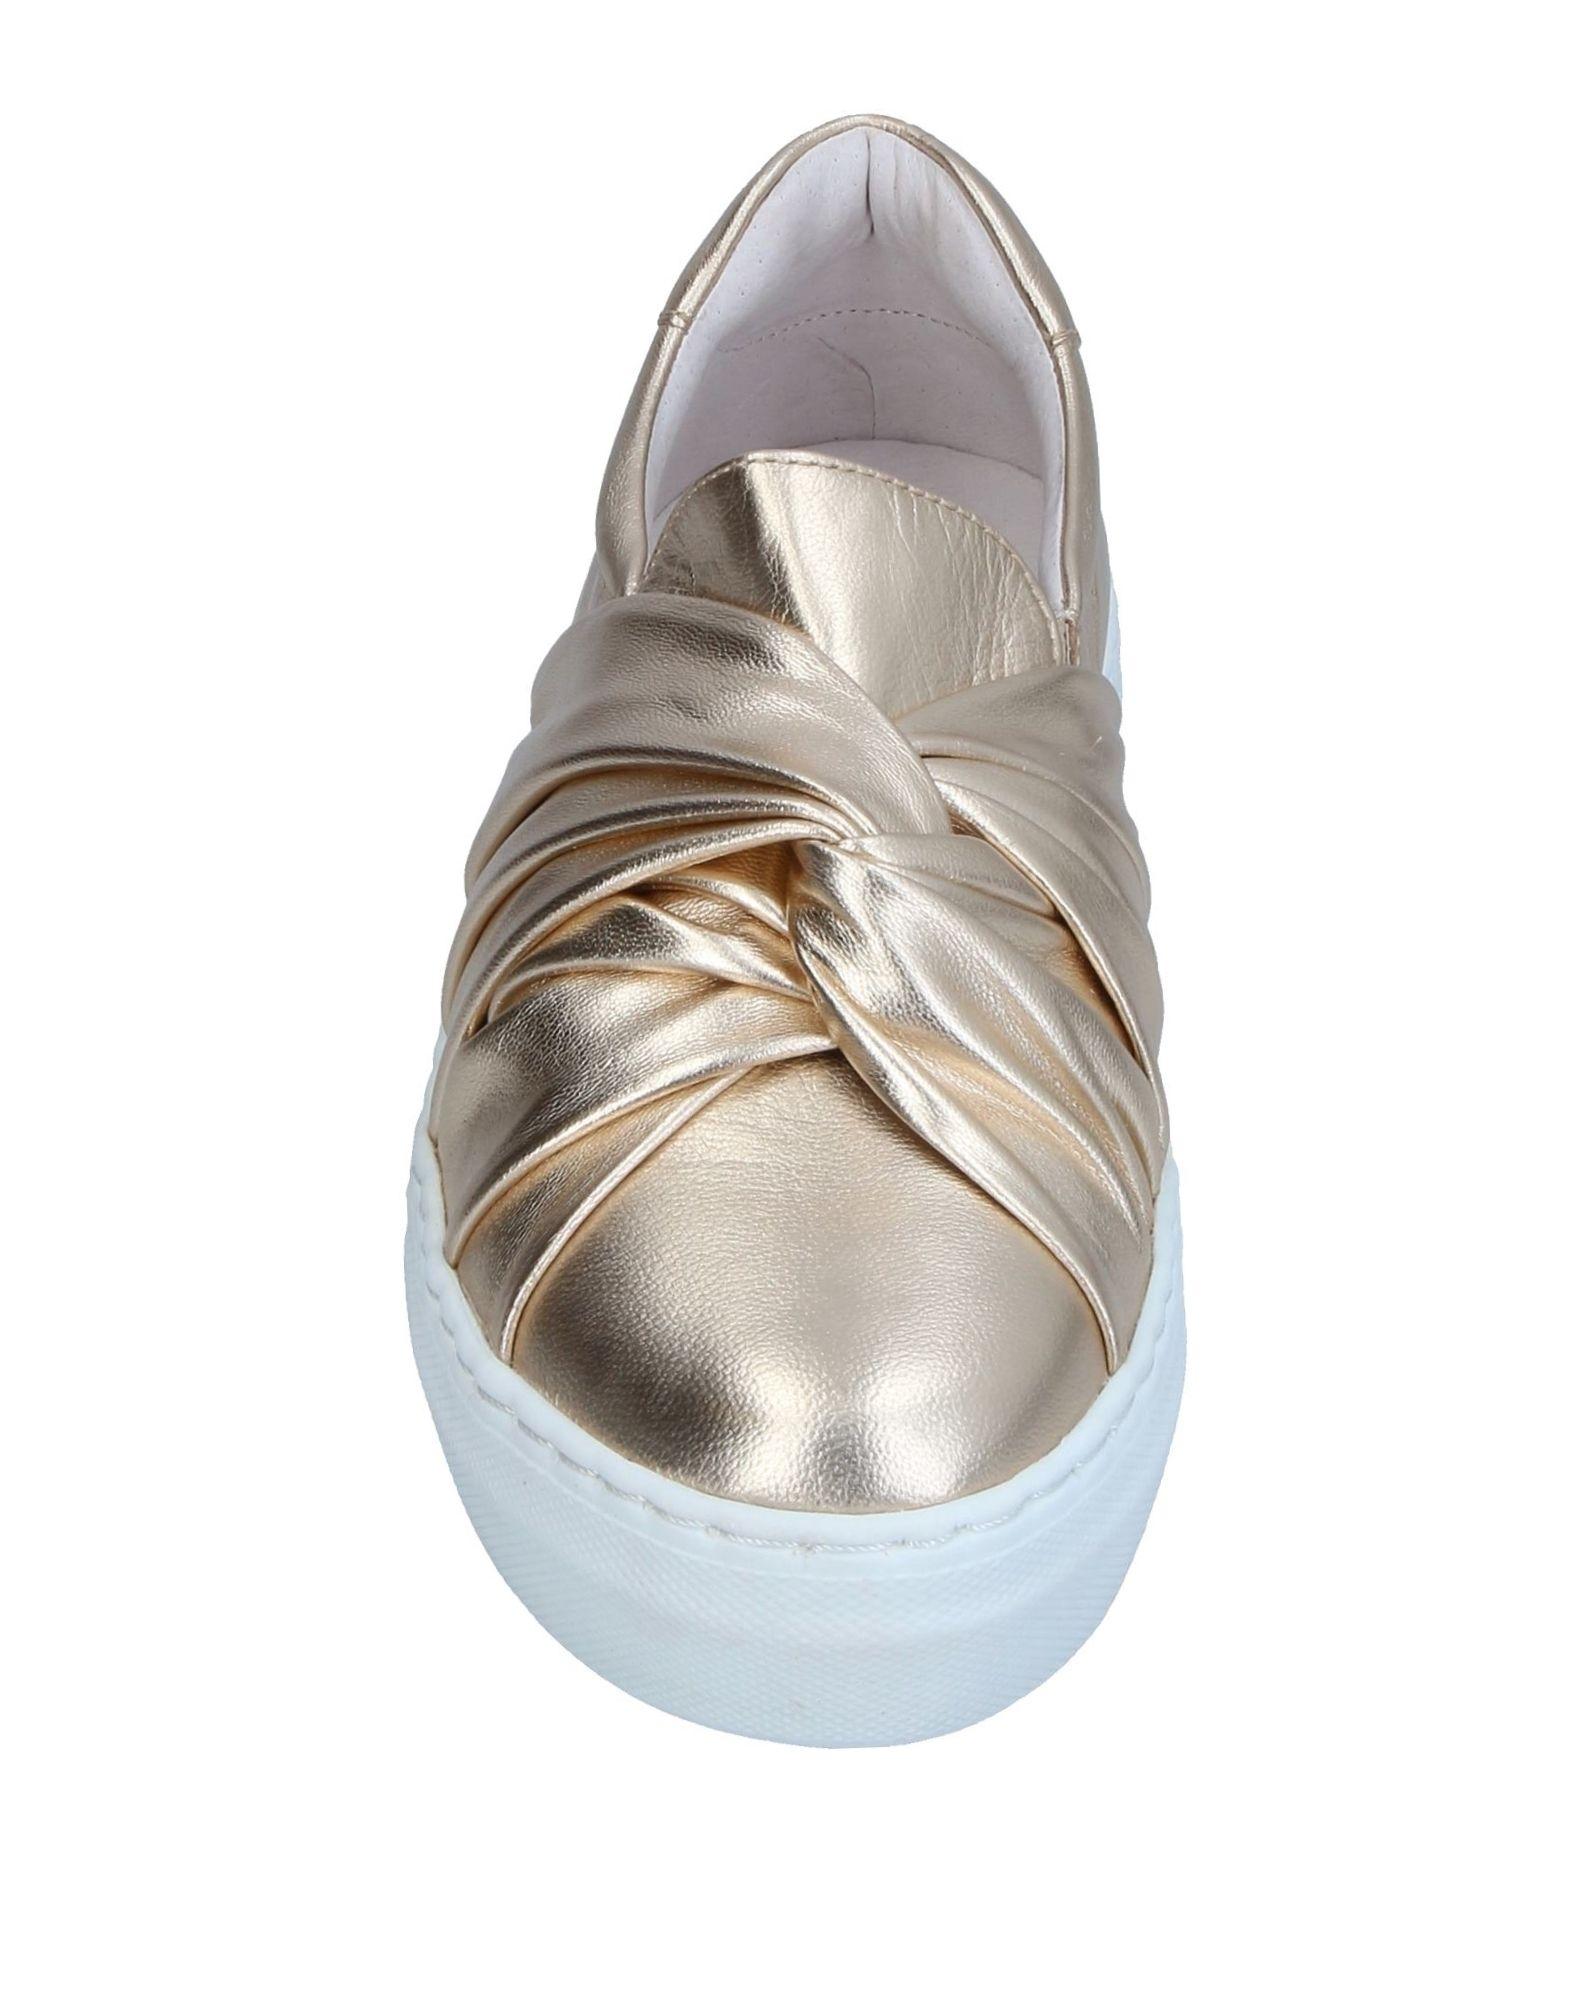 Altraofficina Sneakers Damen   Damen 11369658KN  03ab52